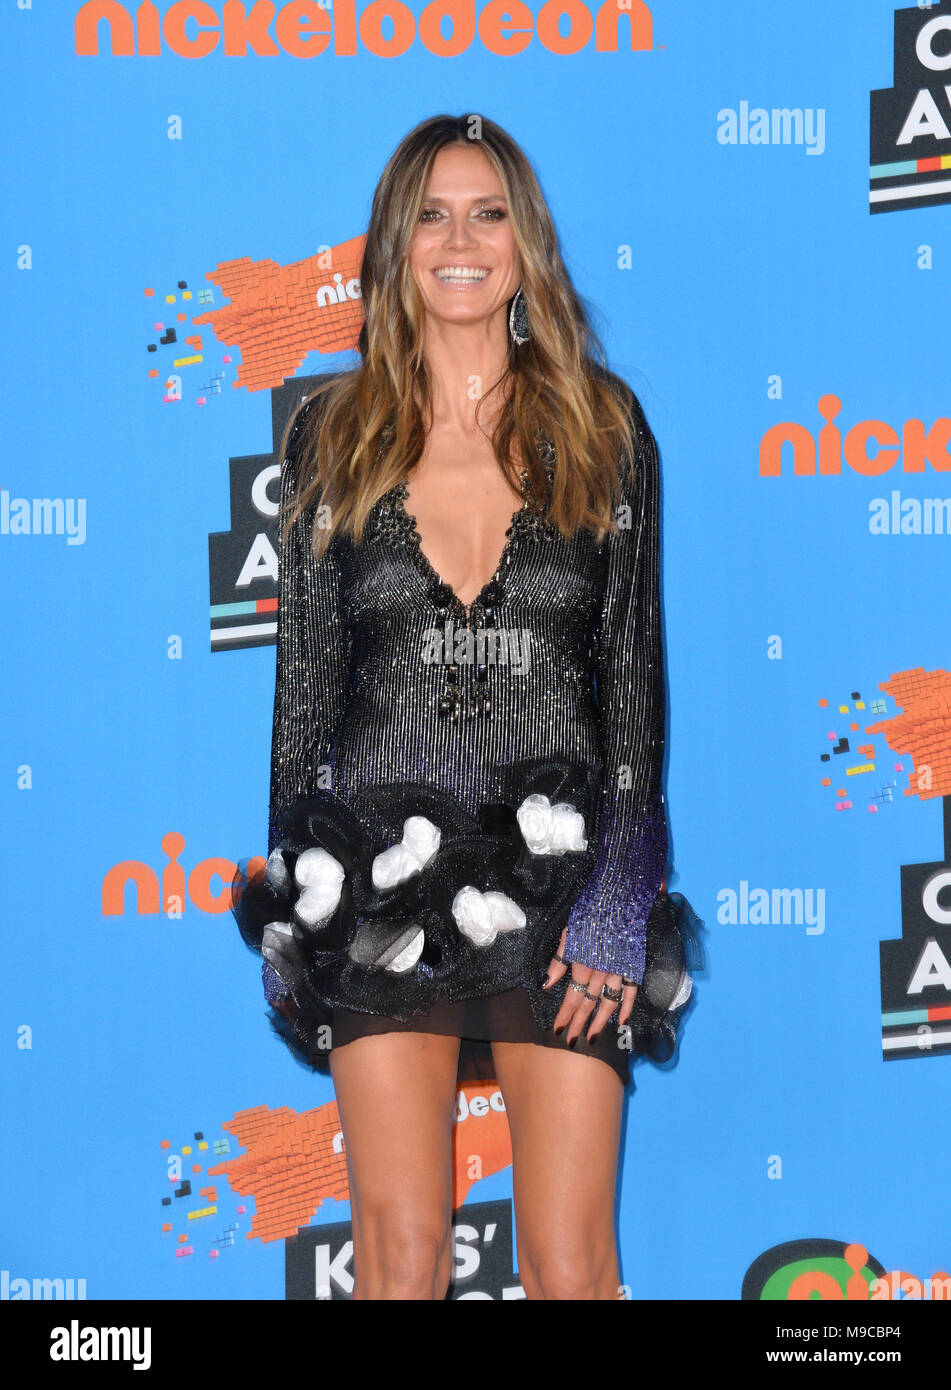 LOS ANGELES, CA  March 24, 2018: Heidi Klum at Nickelodeon's